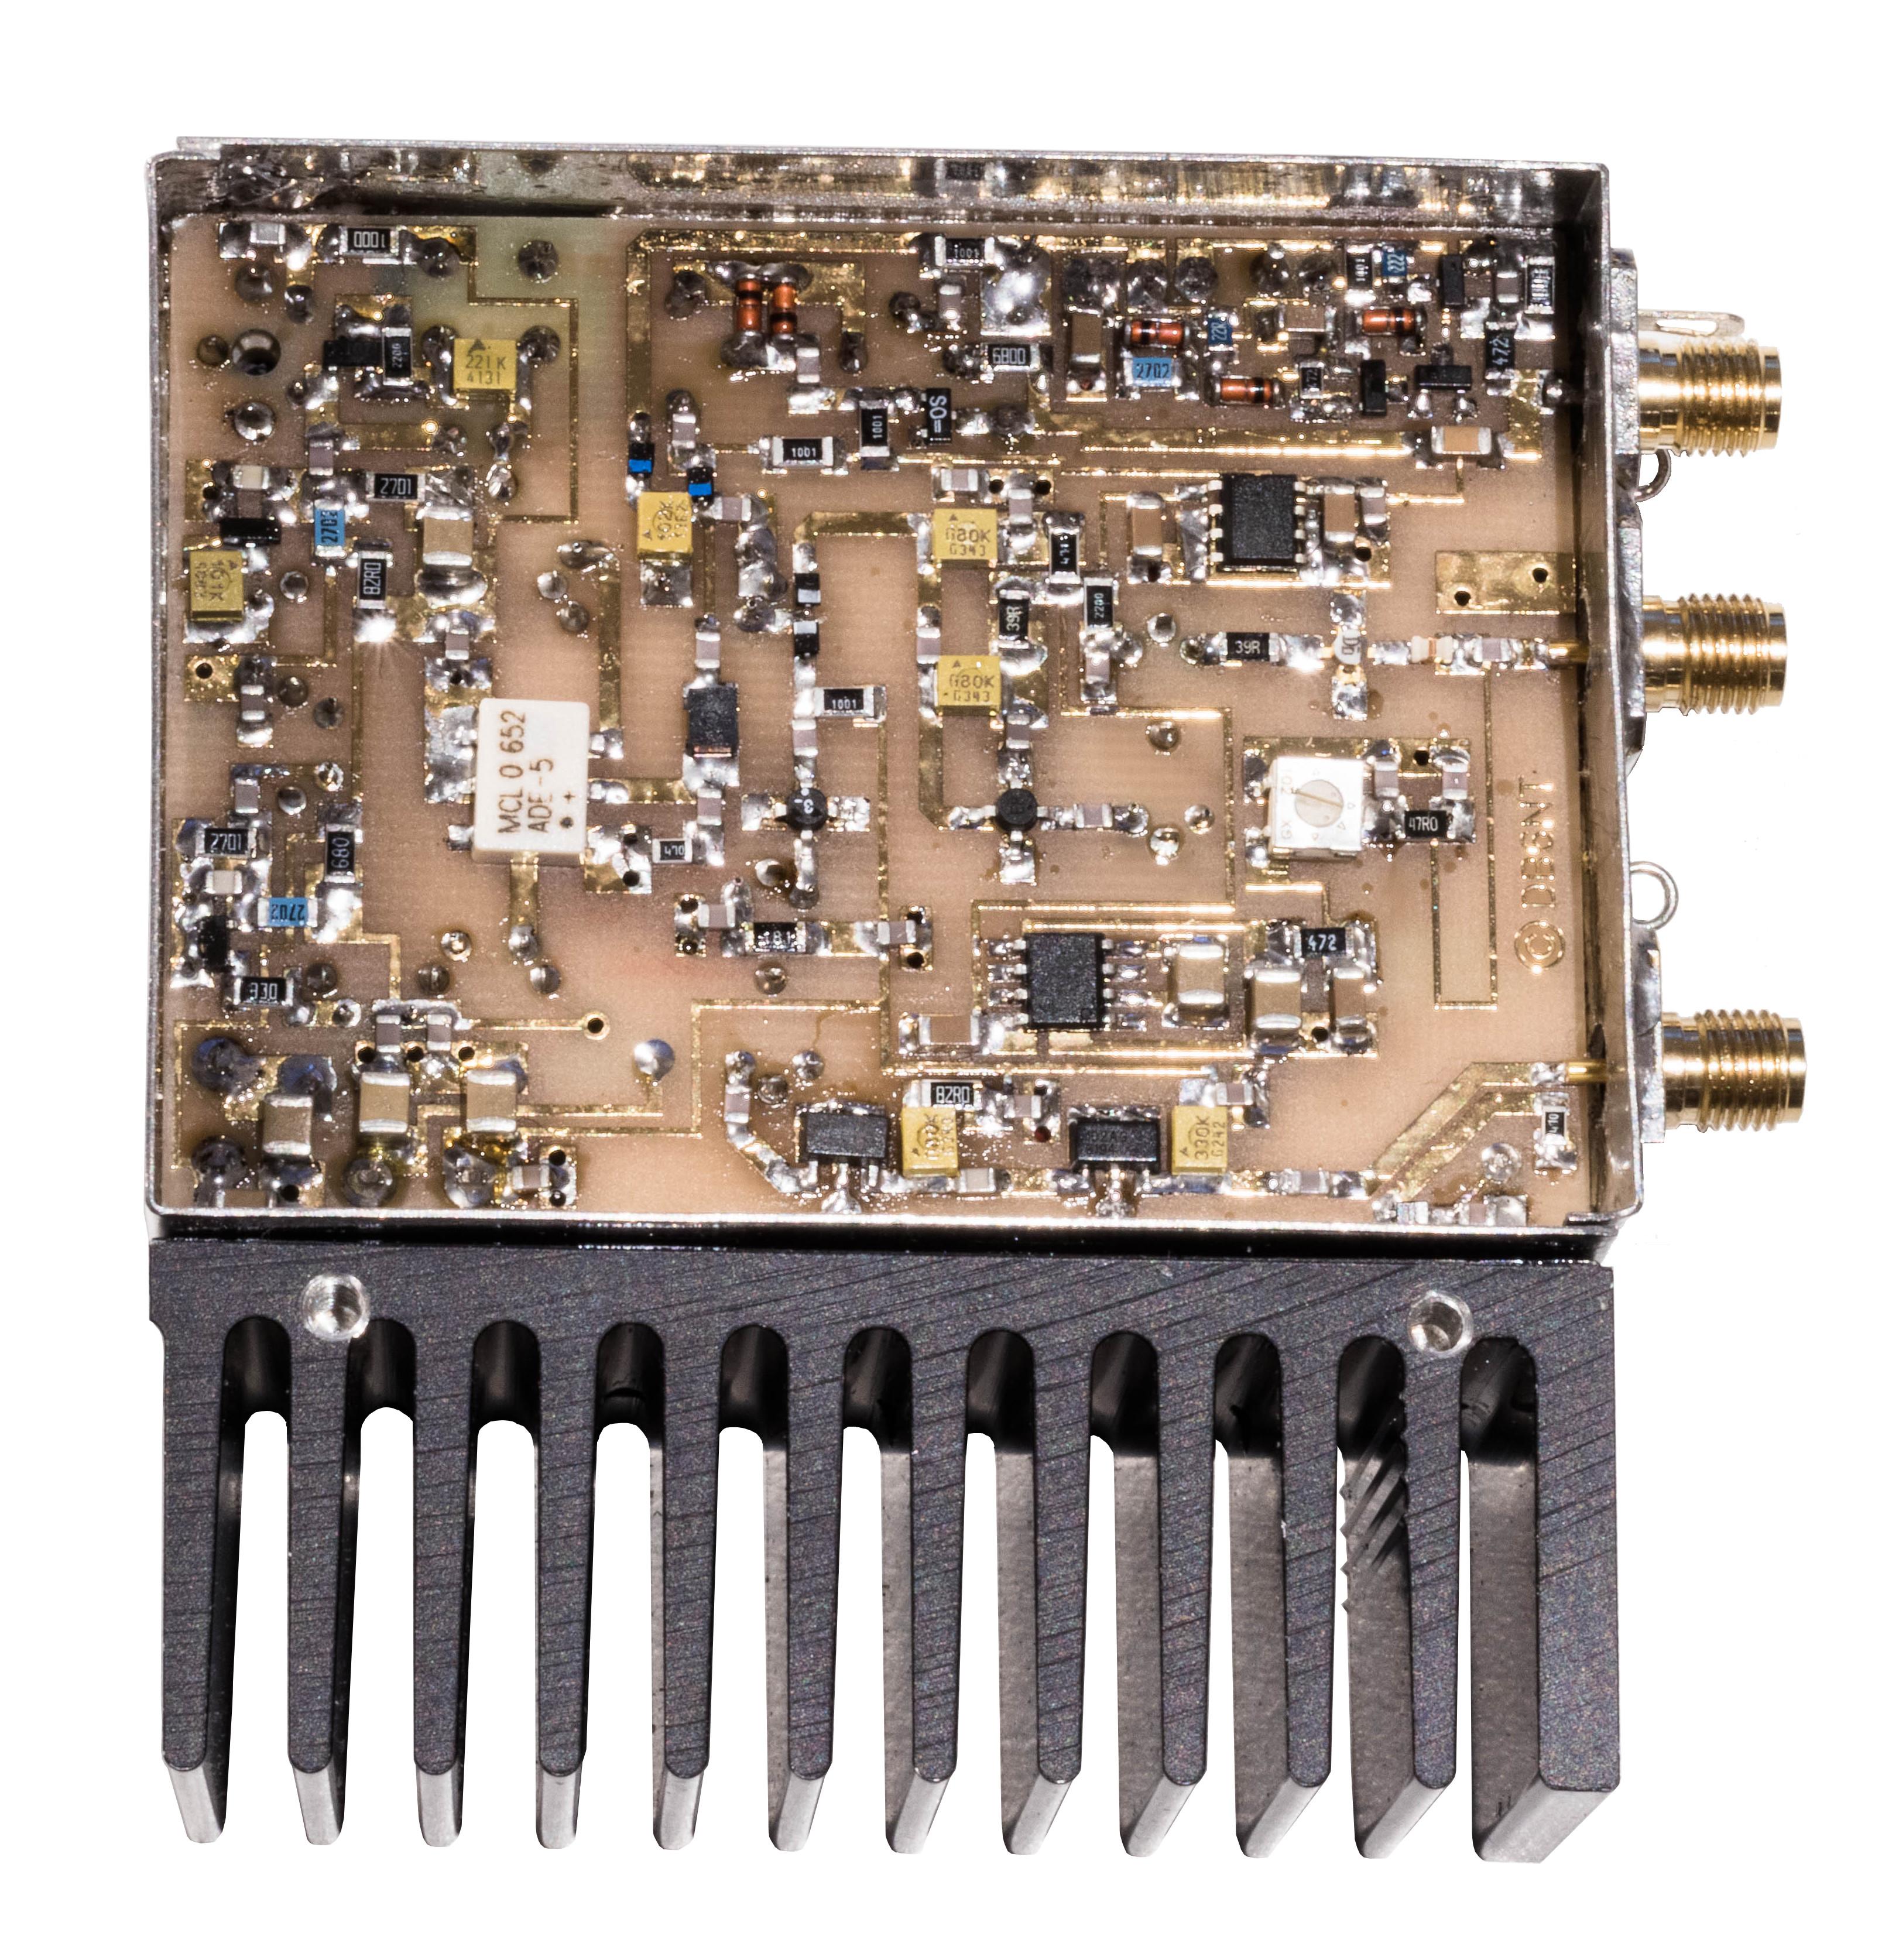 23 cm Transverter (28 MHz / 1296 MHz) - DB6NT KIT